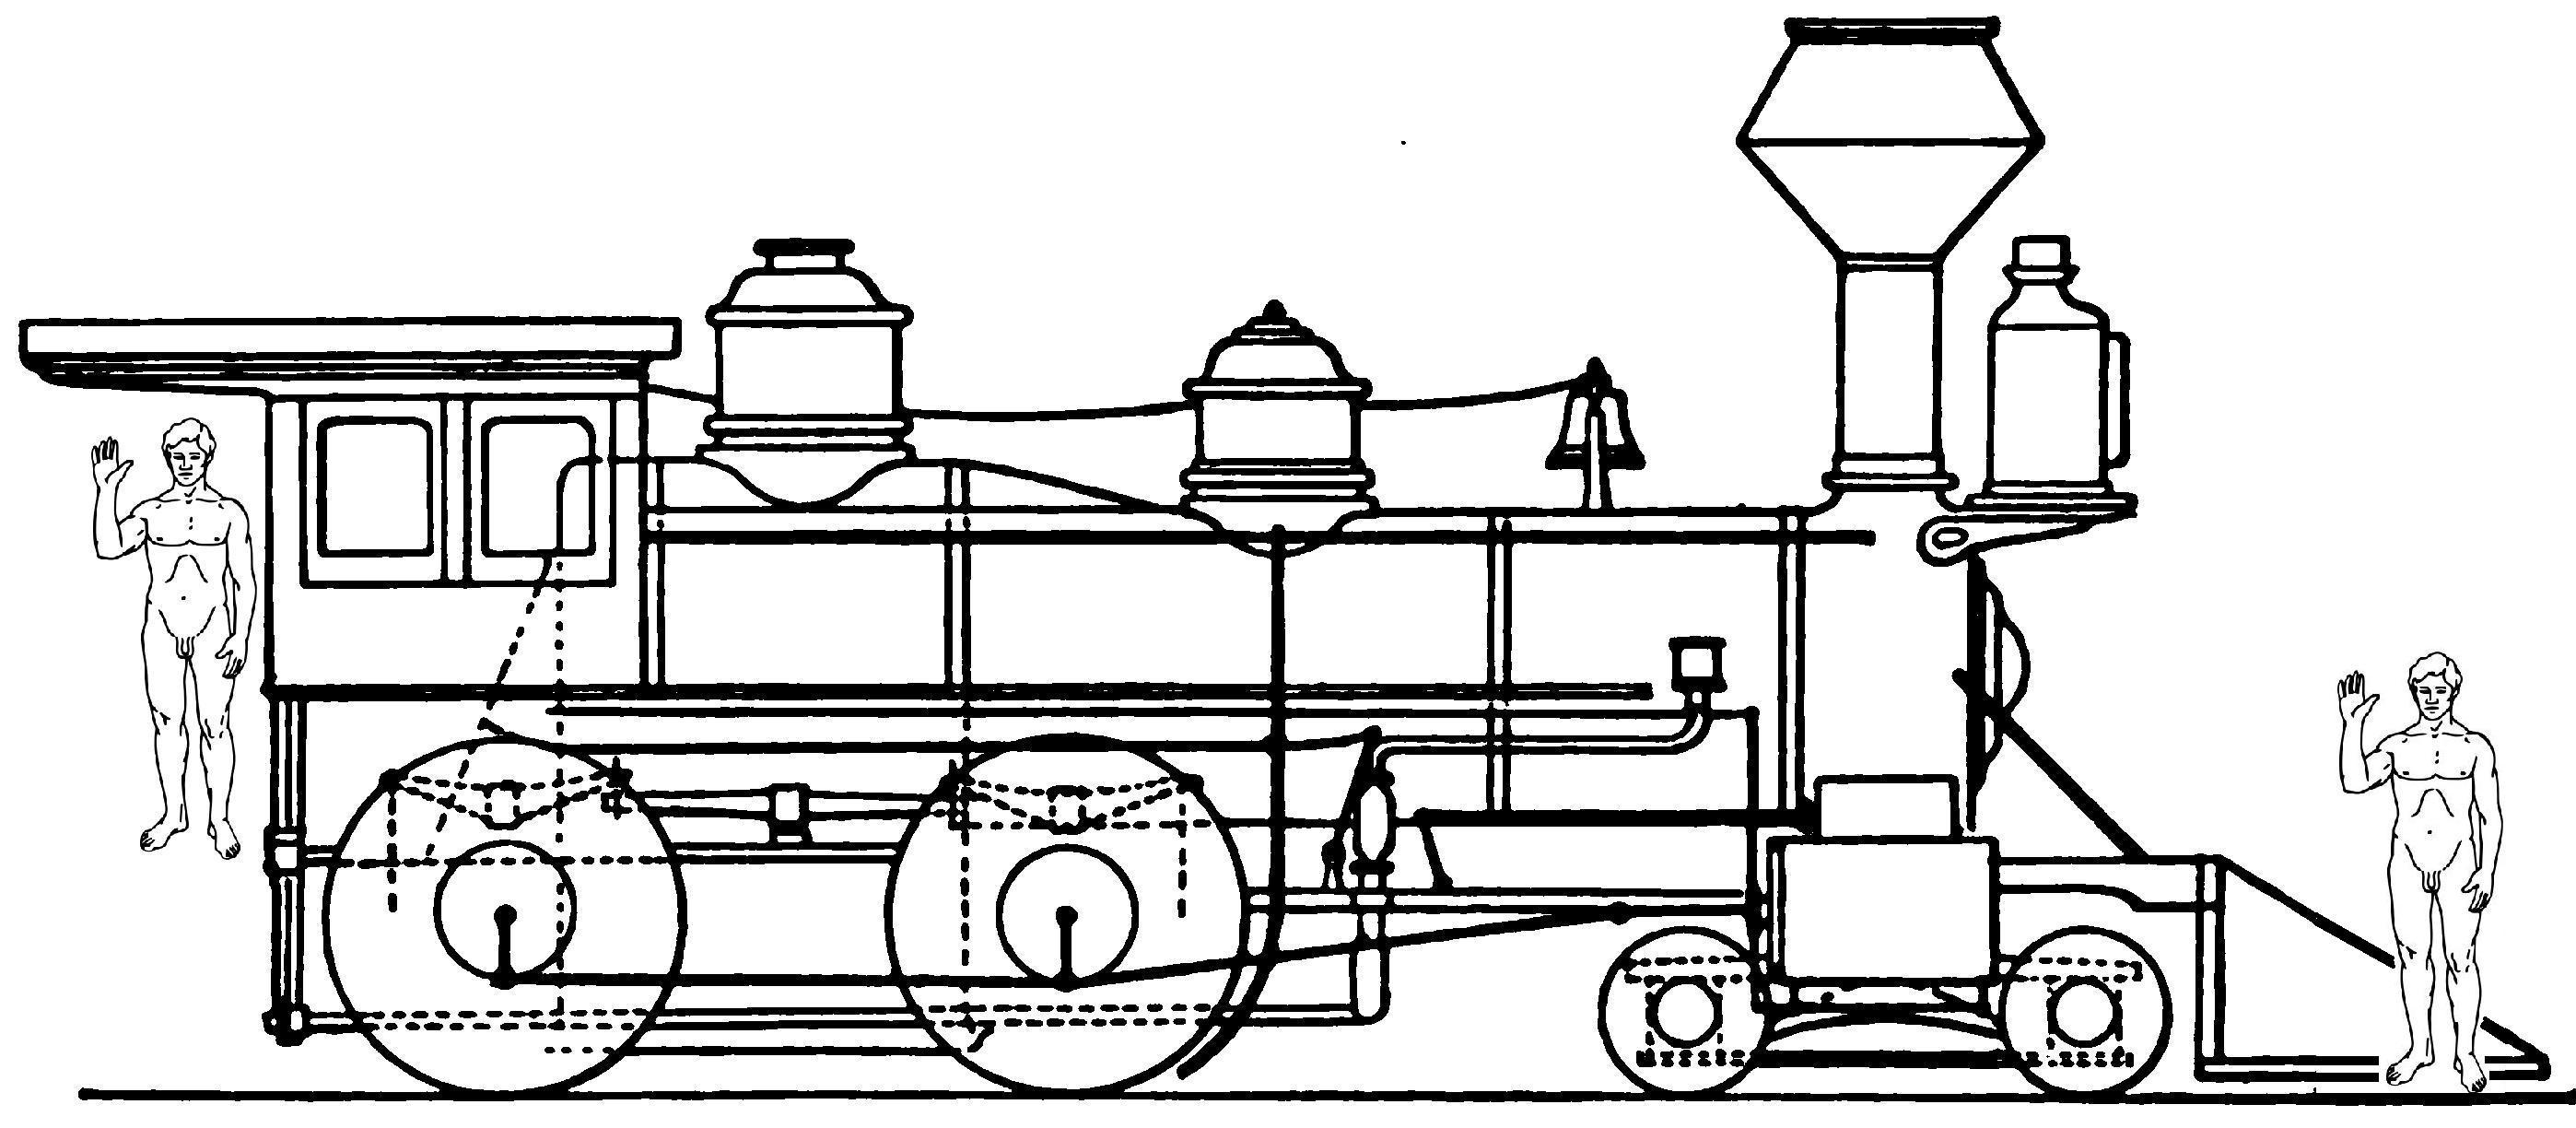 steam locomotive diagram related keywords suggestions steam